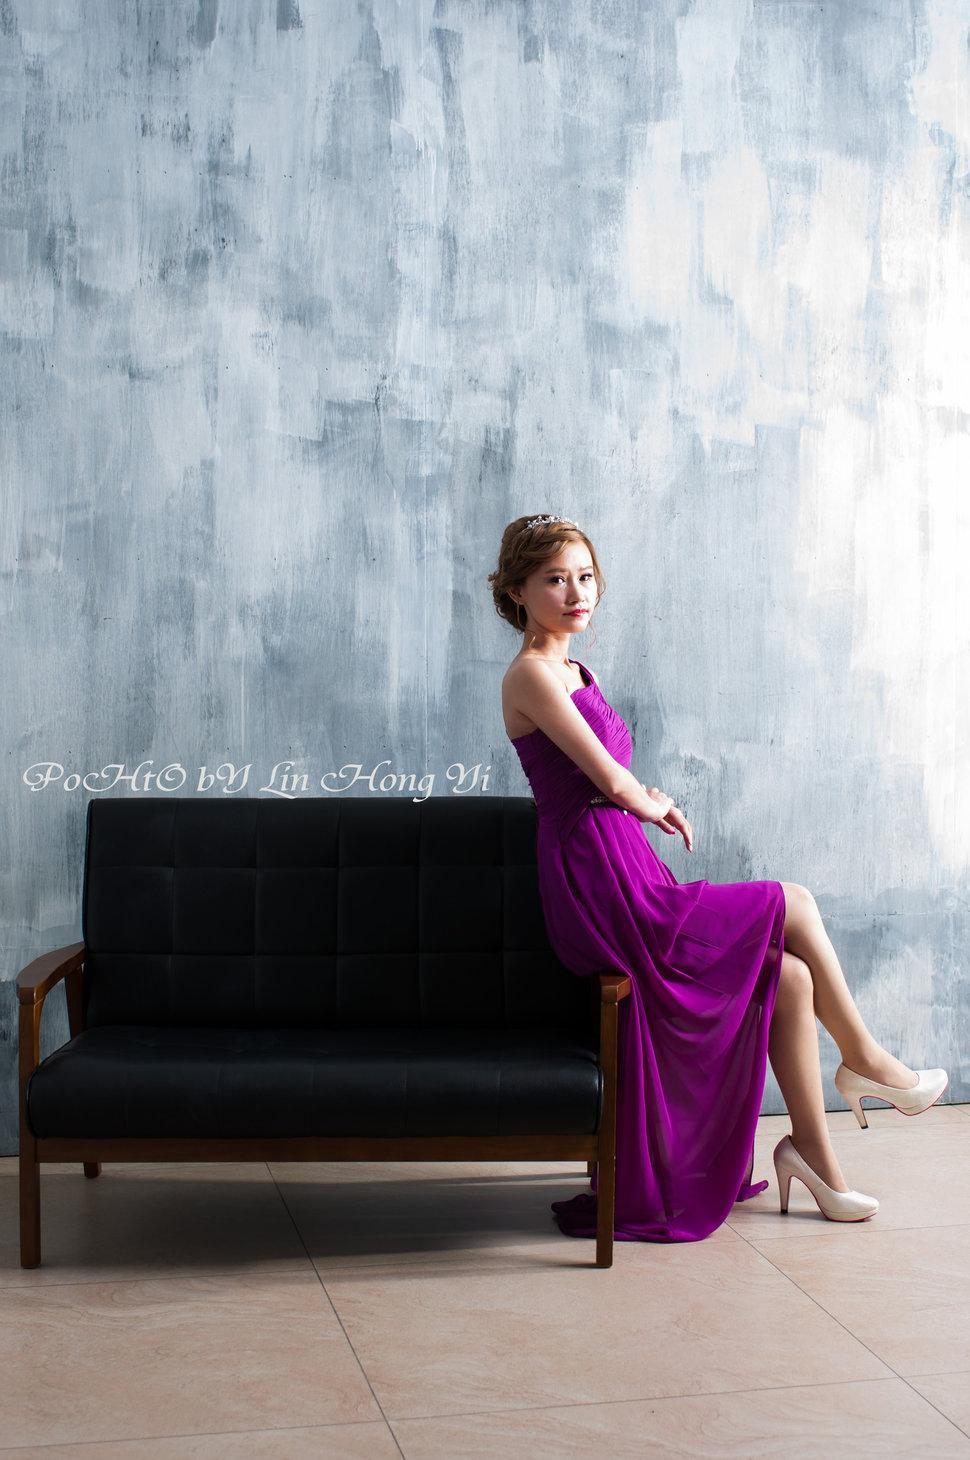 DSC_1350 - 小林哥Hung YI攝影工作室《結婚吧》